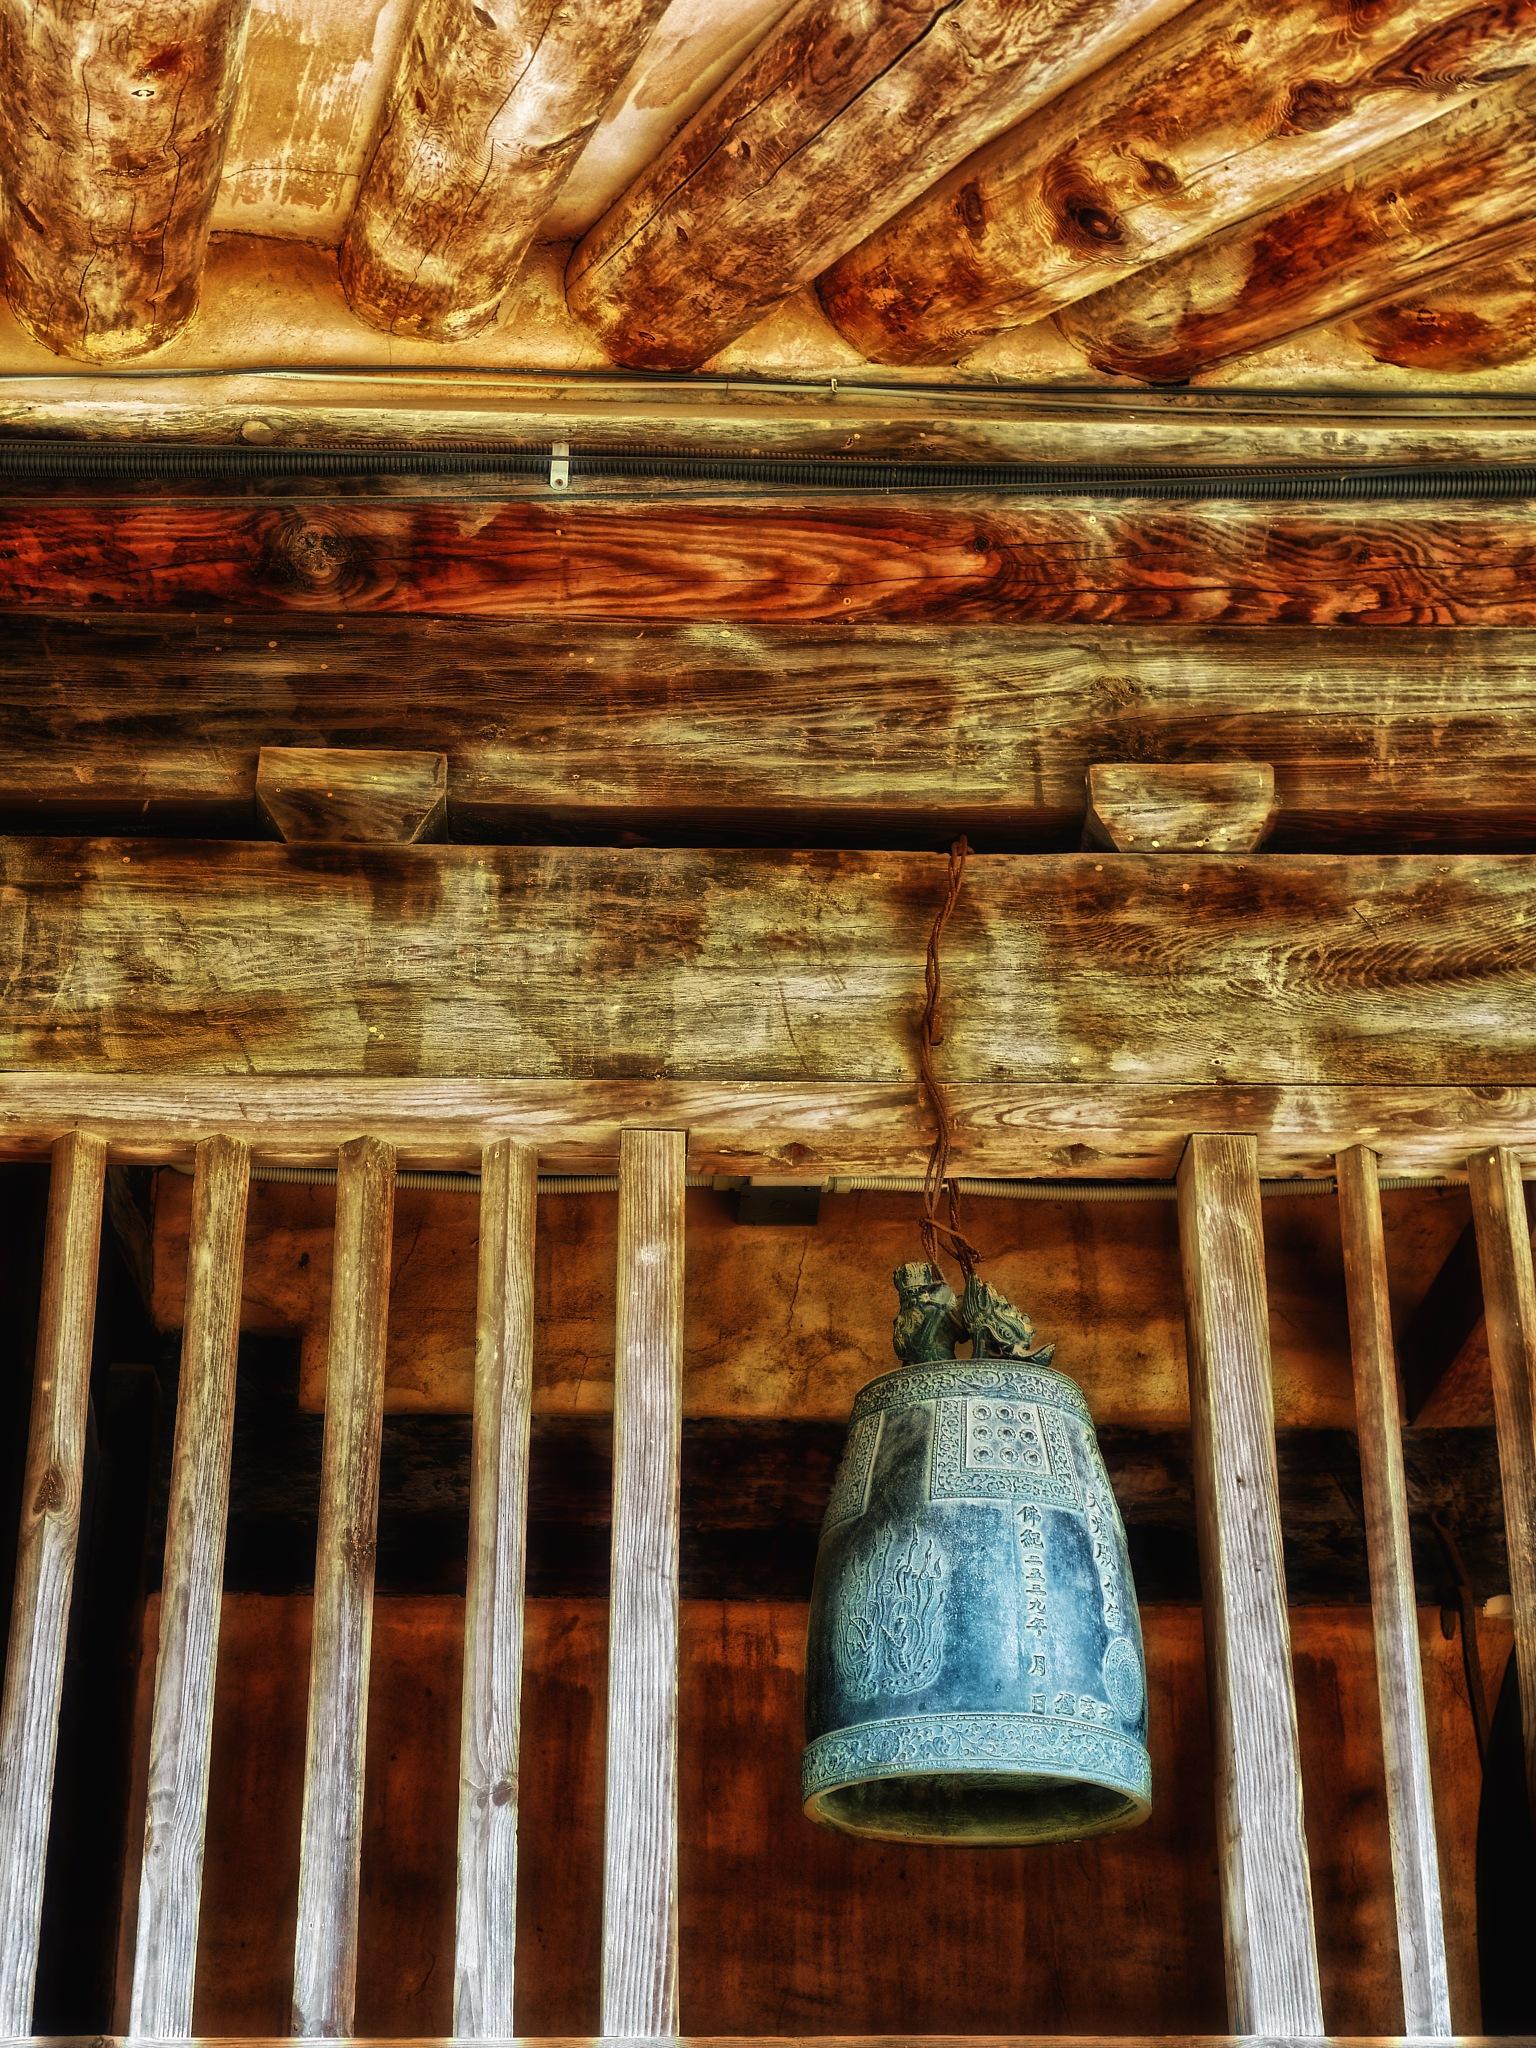 Prayer Bell by Sebastian Von Szuts